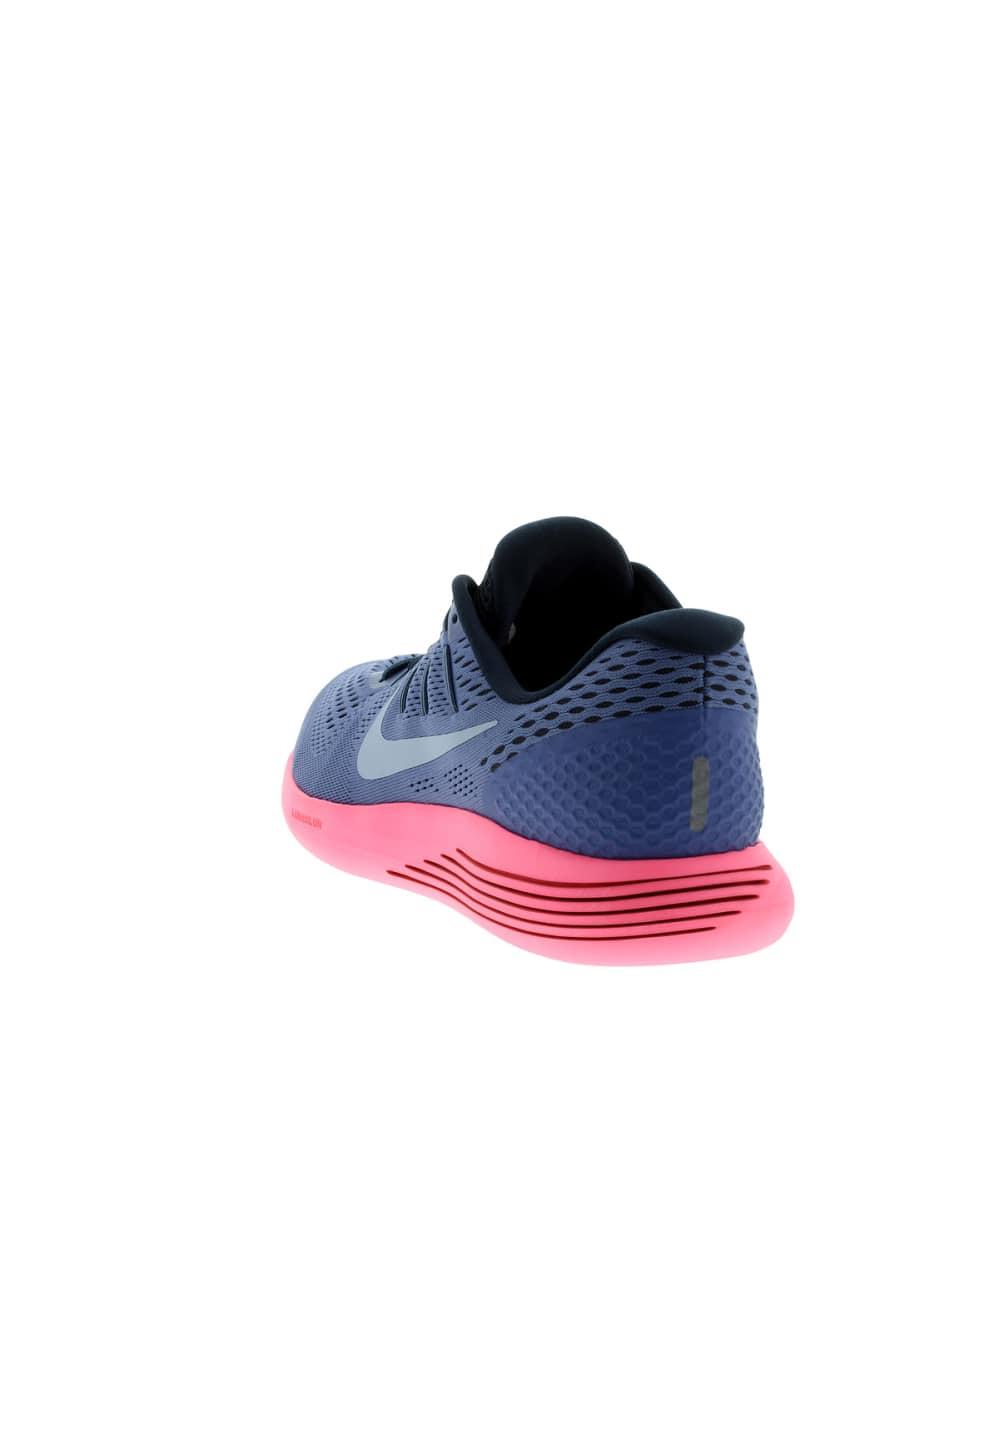 new arrival 61980 89991 Nike Lunarglide 8 - Running shoes for Women - Blue   21RUN